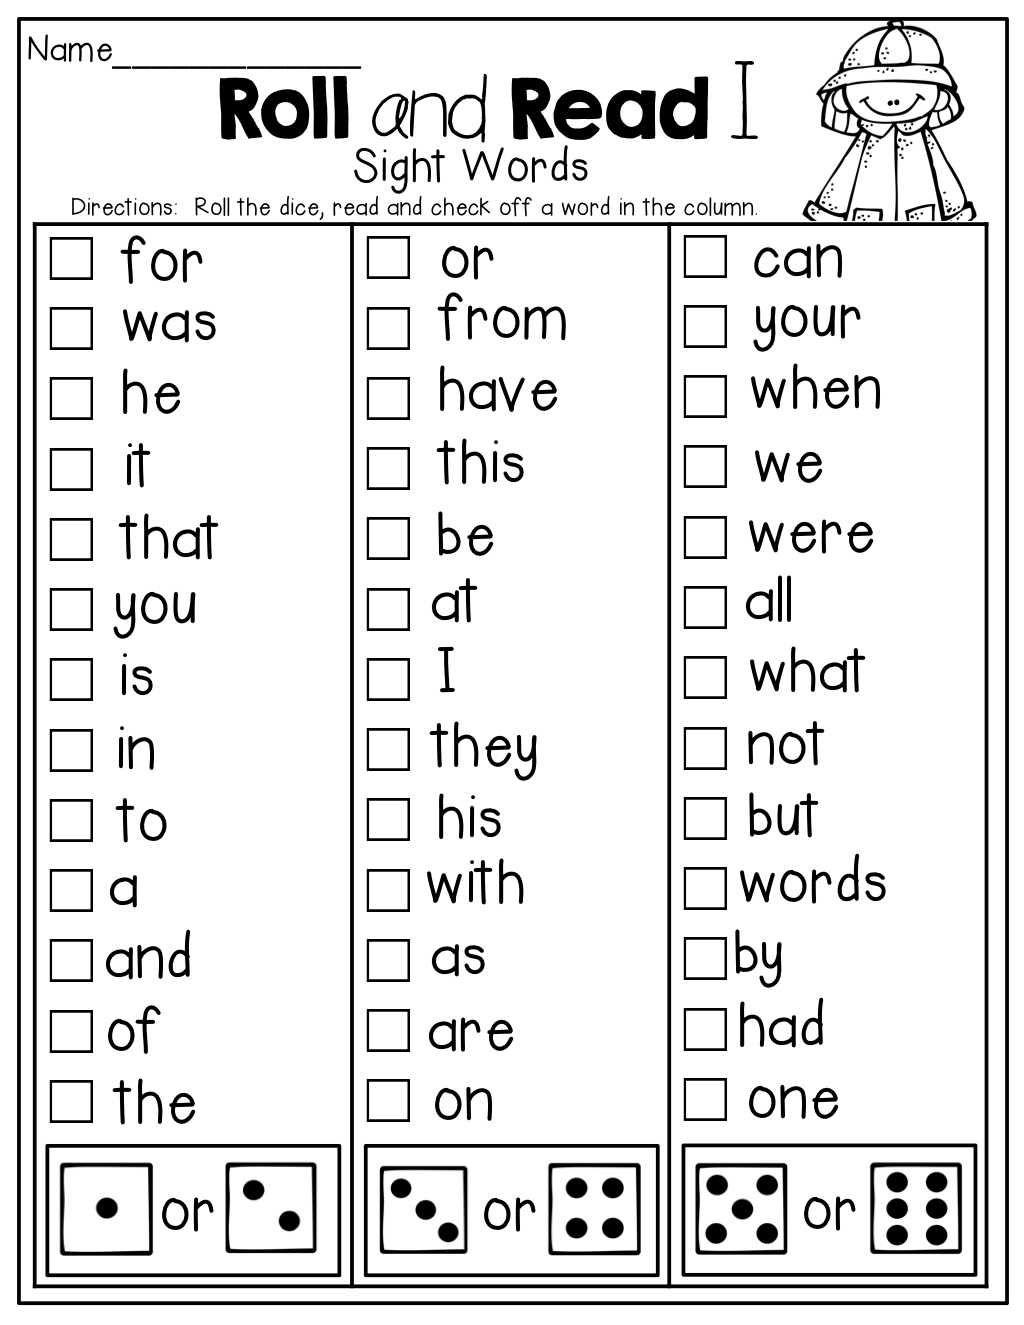 Sight Words Voice Levels Behavior Plans Close Reading